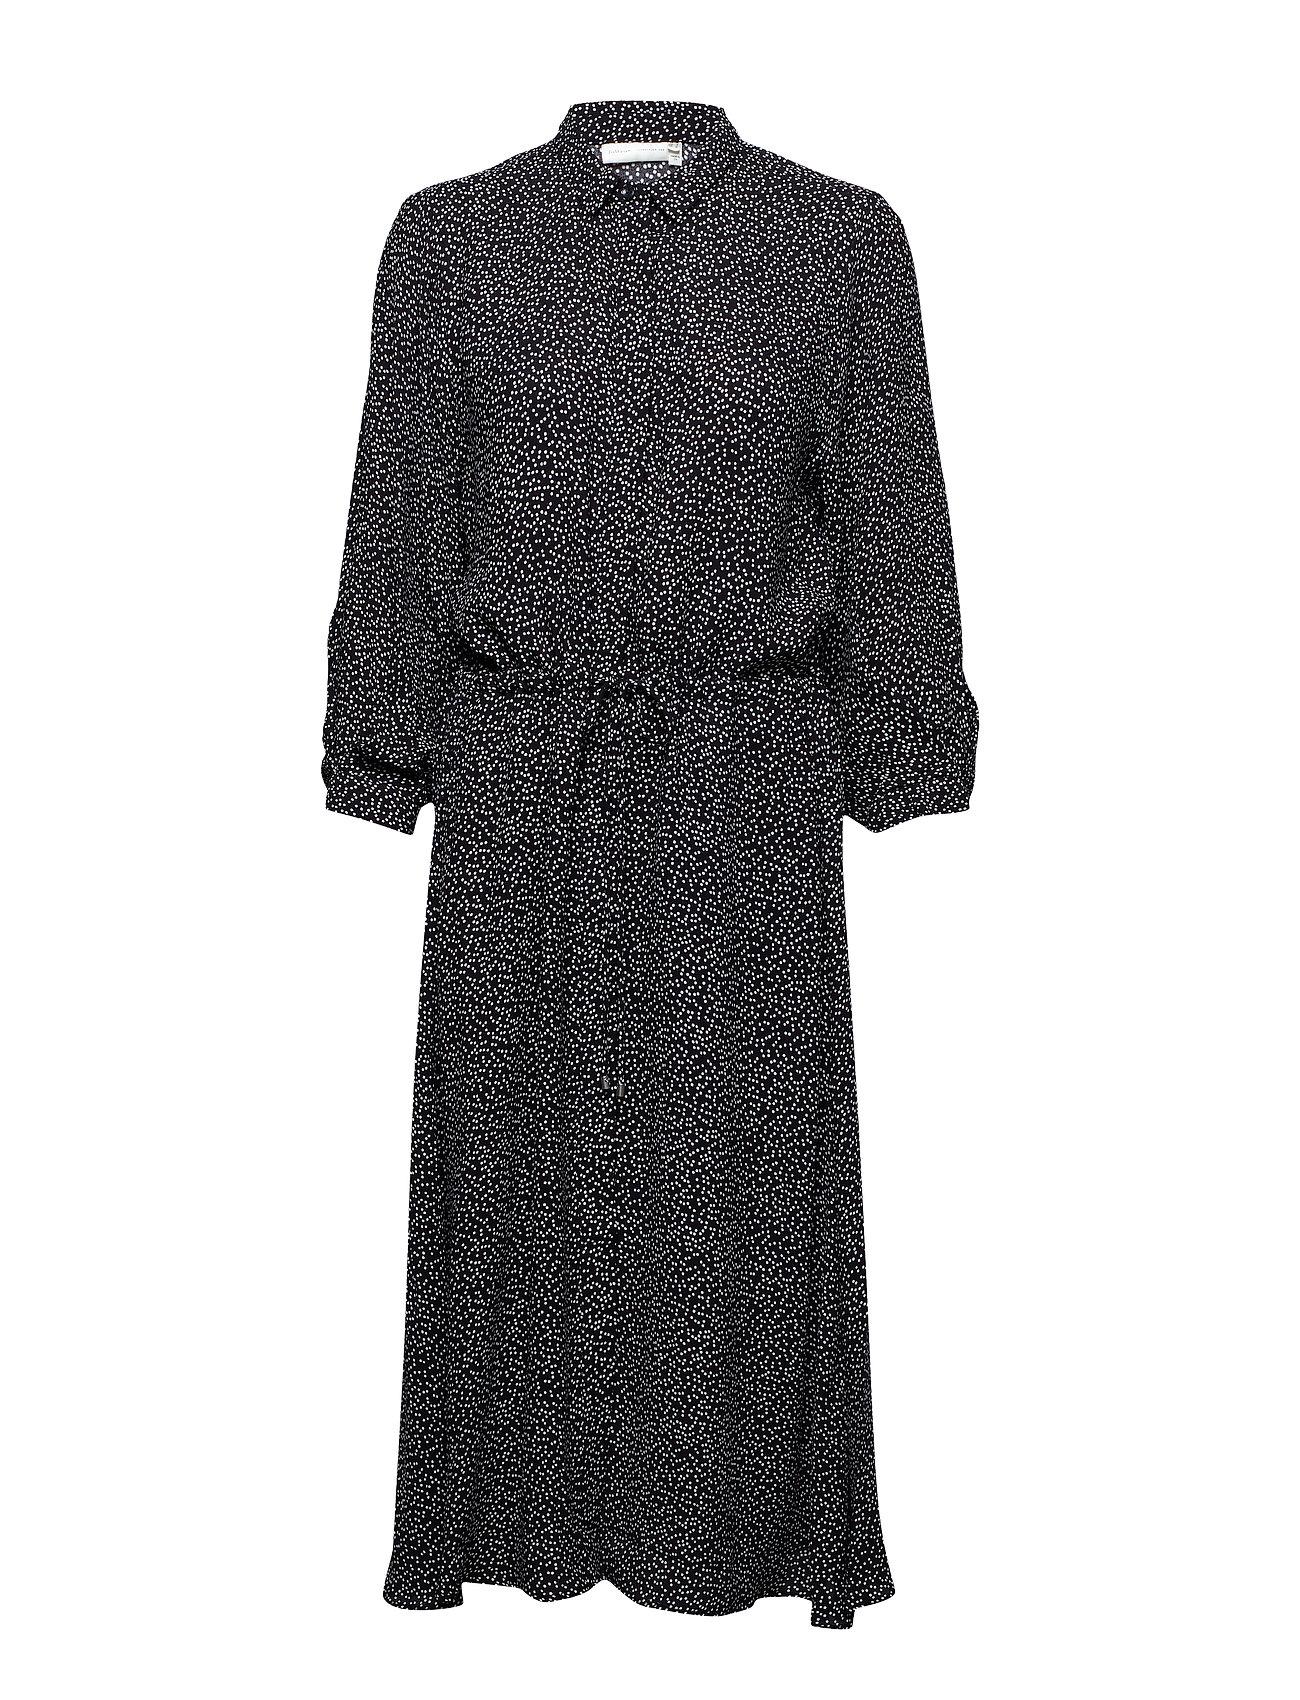 InWear Harlow Dress - BLACK MINIMAL DOT